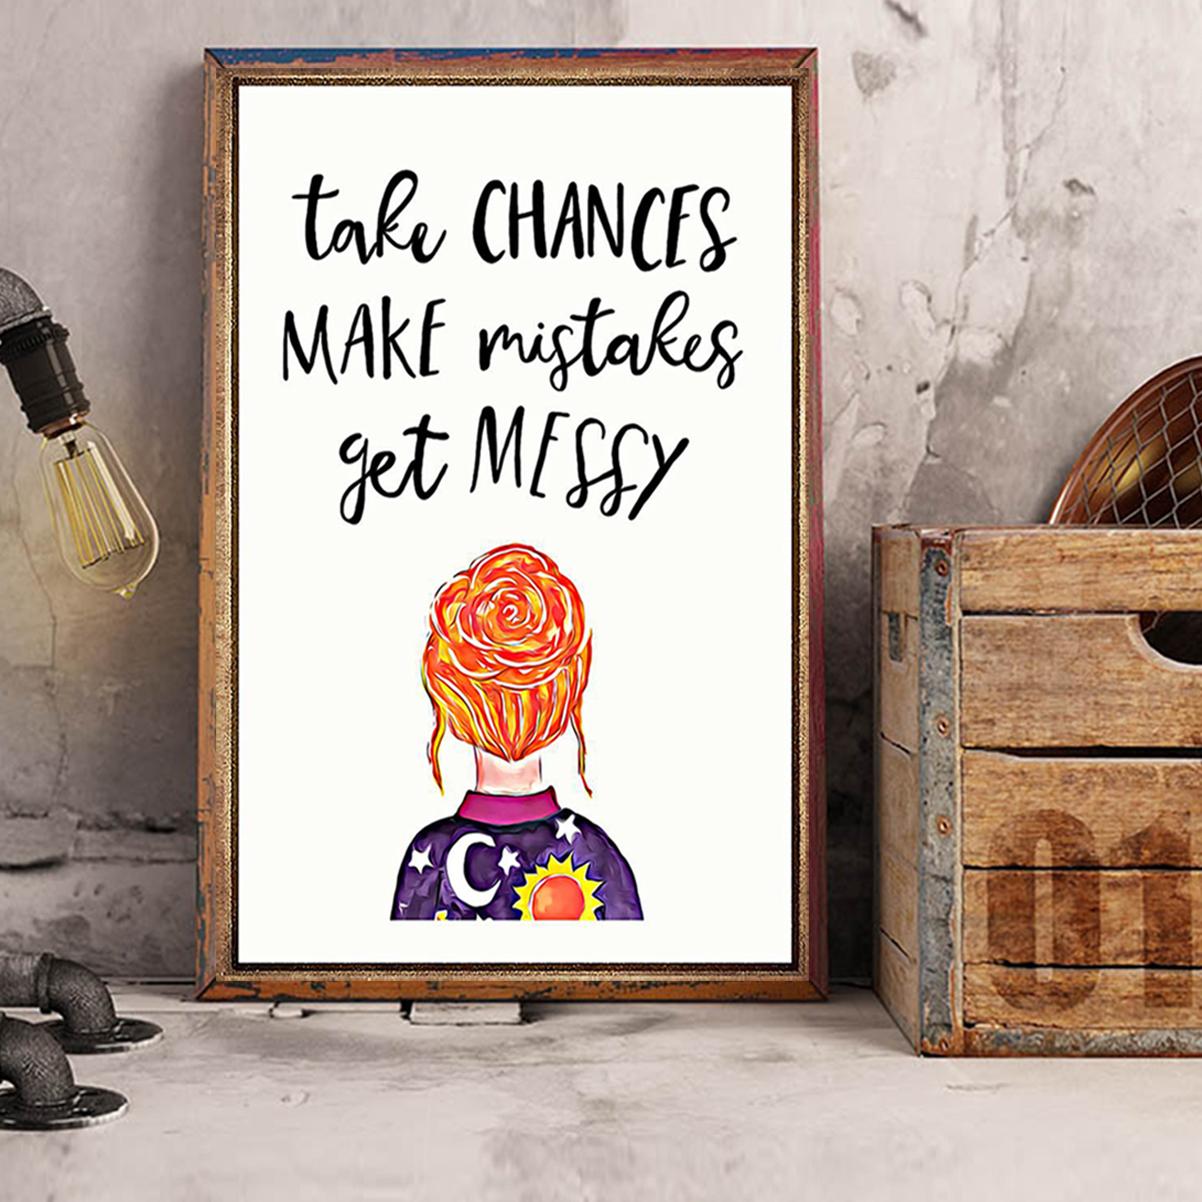 Teacher take chances make mistakes get messy poster A3